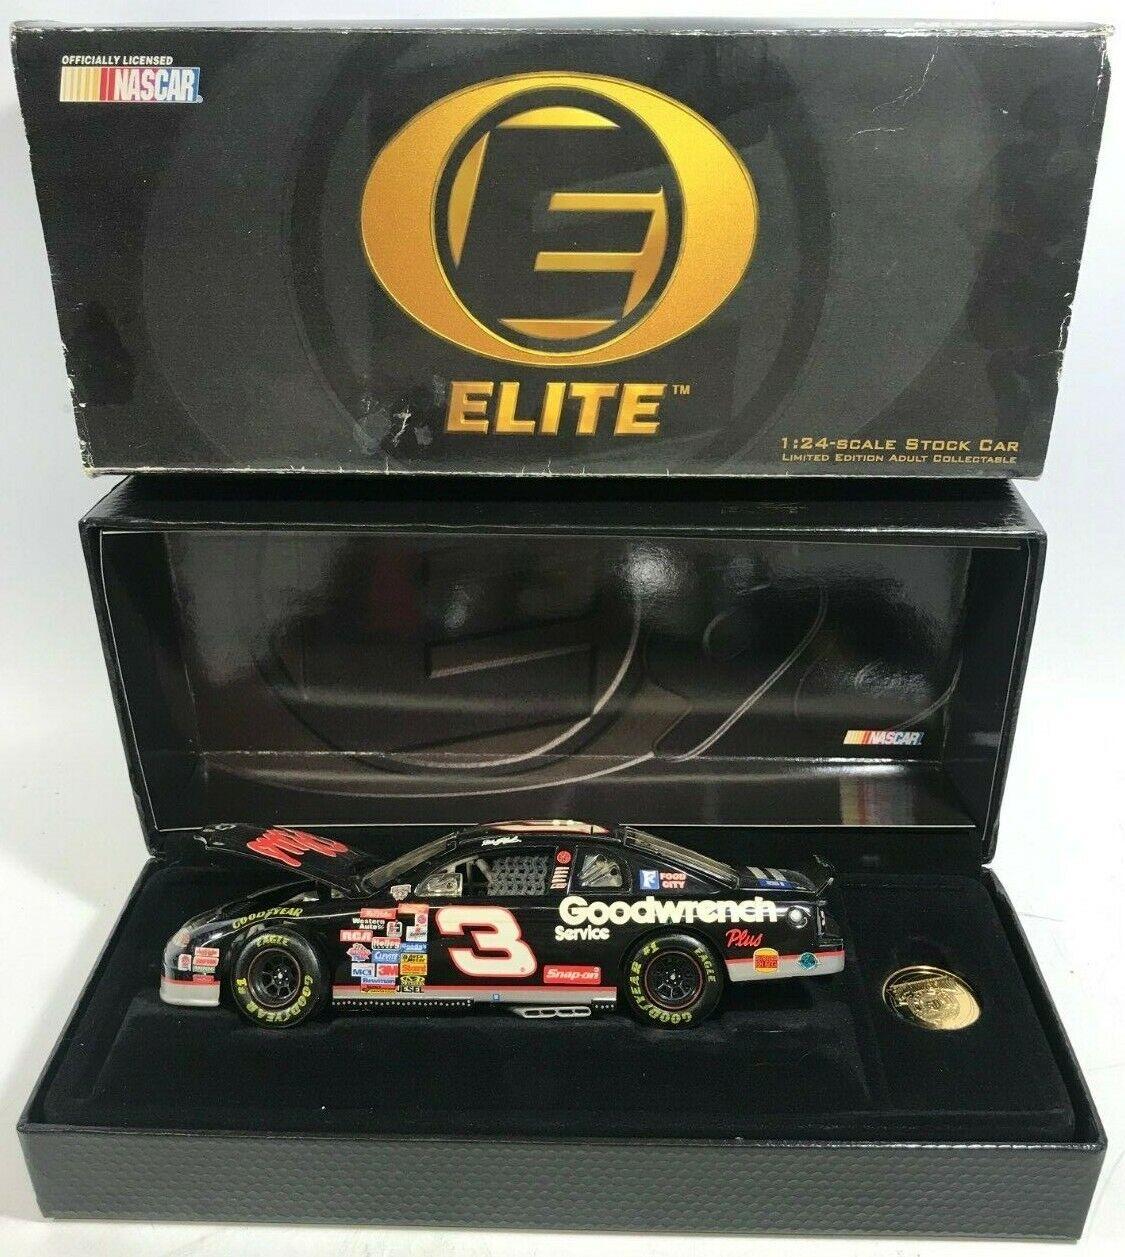 DaleEarnhardt GoodwrenchPlus 1998 Monte Carlo Elite NASCAR 50th Anniversary